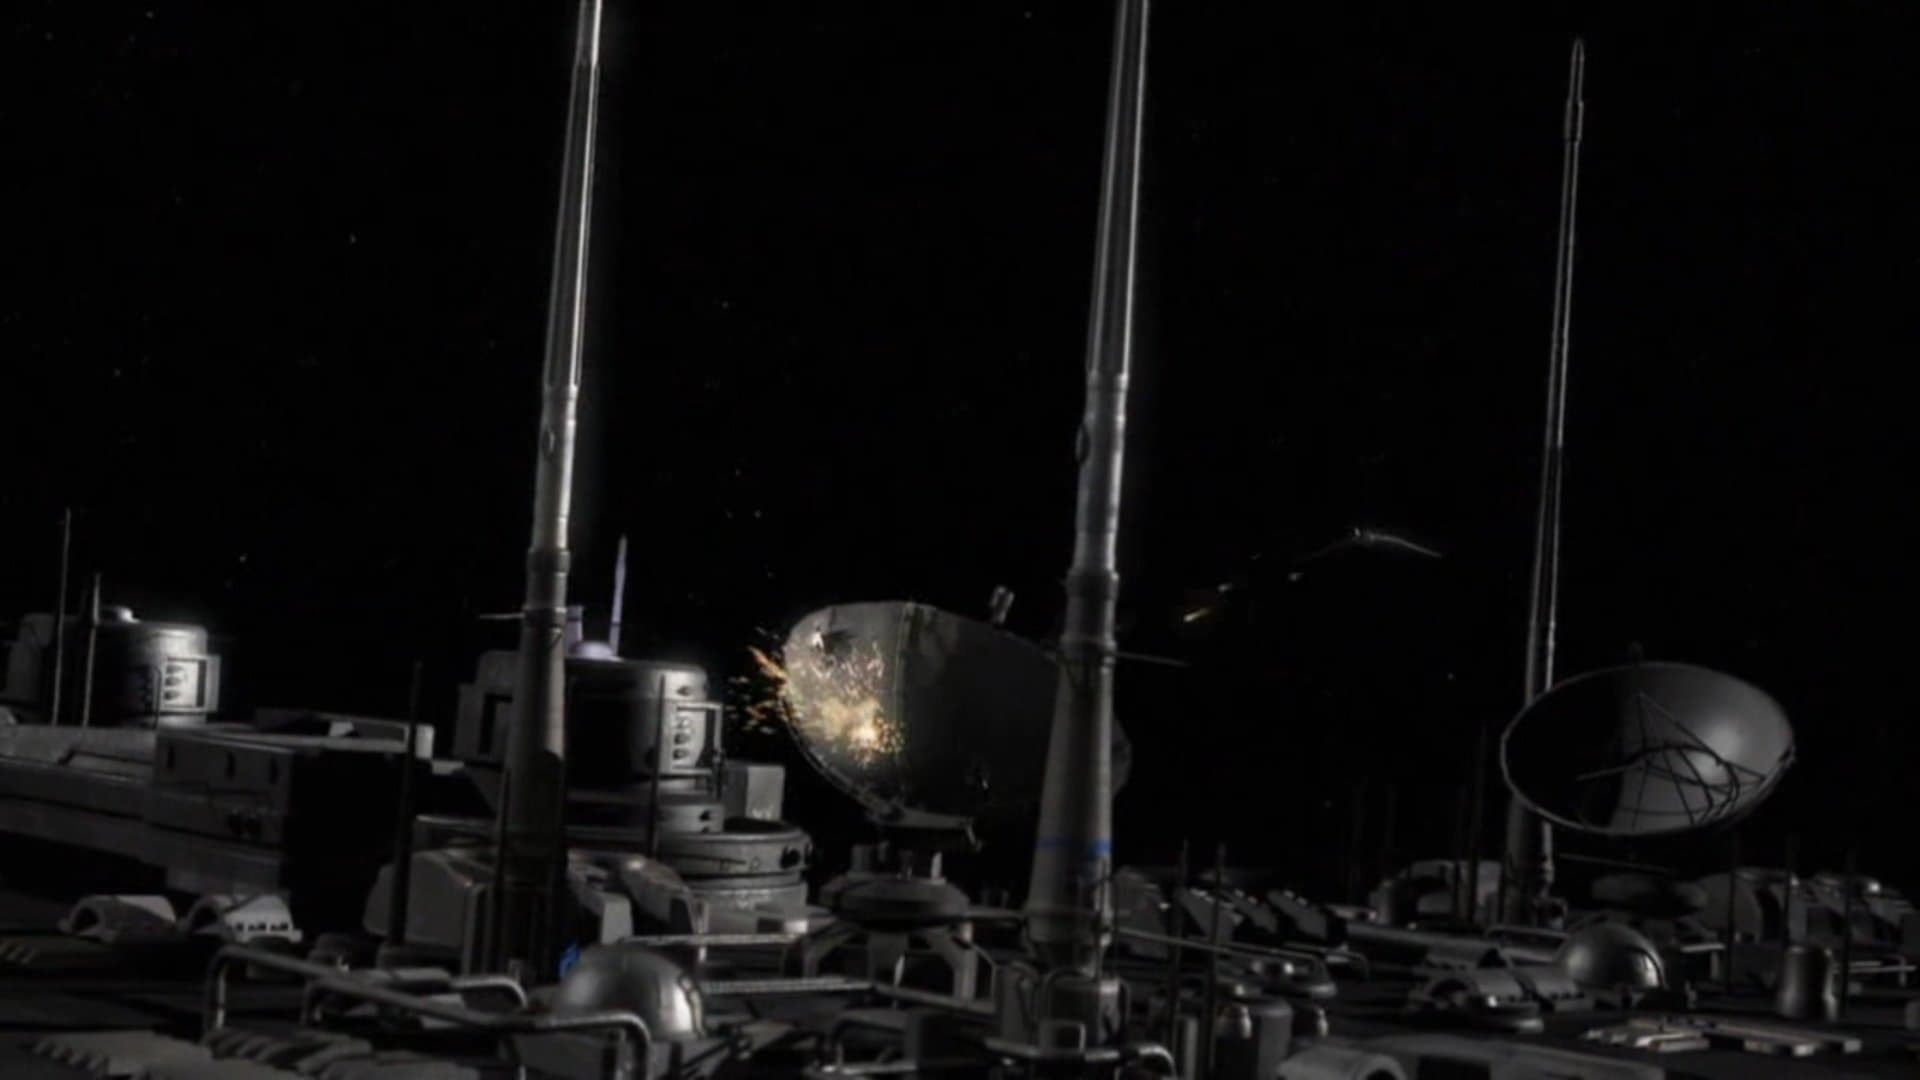 Stargate atlantis saison 2 episode 2 streaming vf et - Stargate la porte des etoiles streaming ...